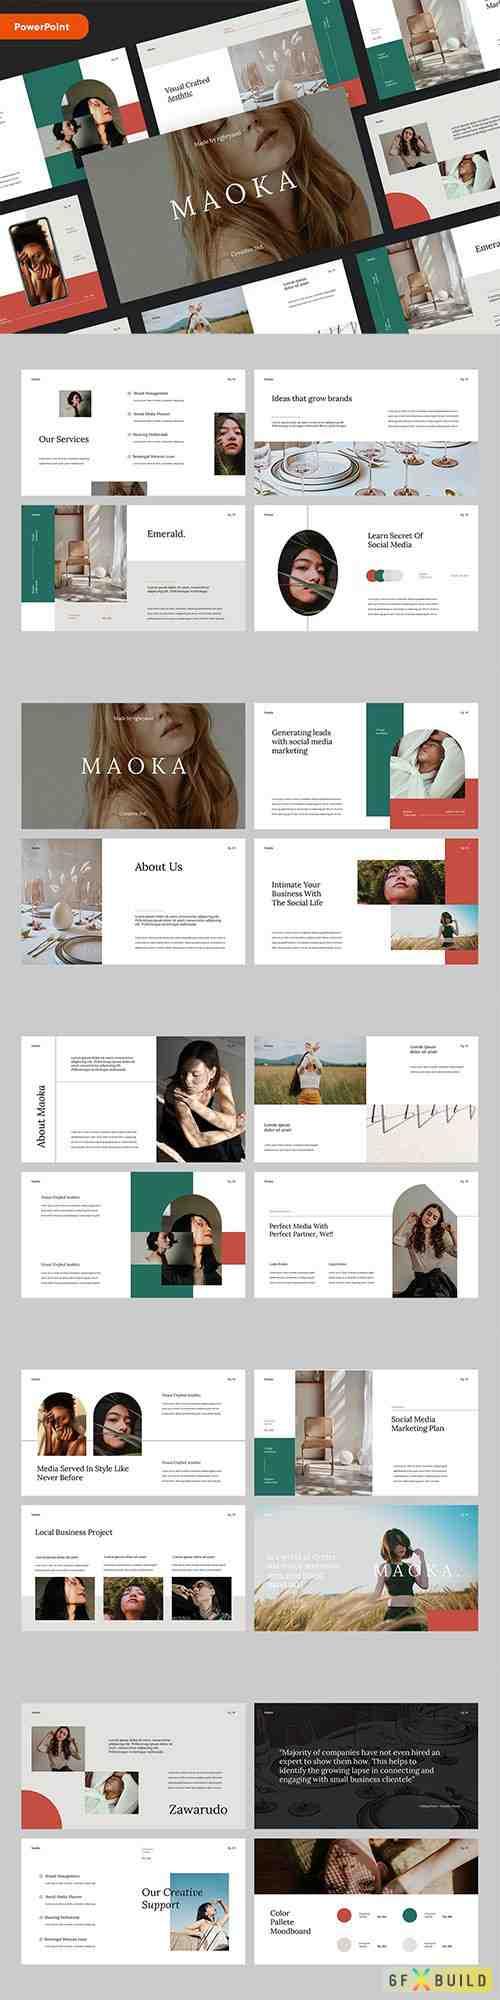 MAOKA - Creative & Elegant Studio PowerPoint, Keynote and Google Slides Template